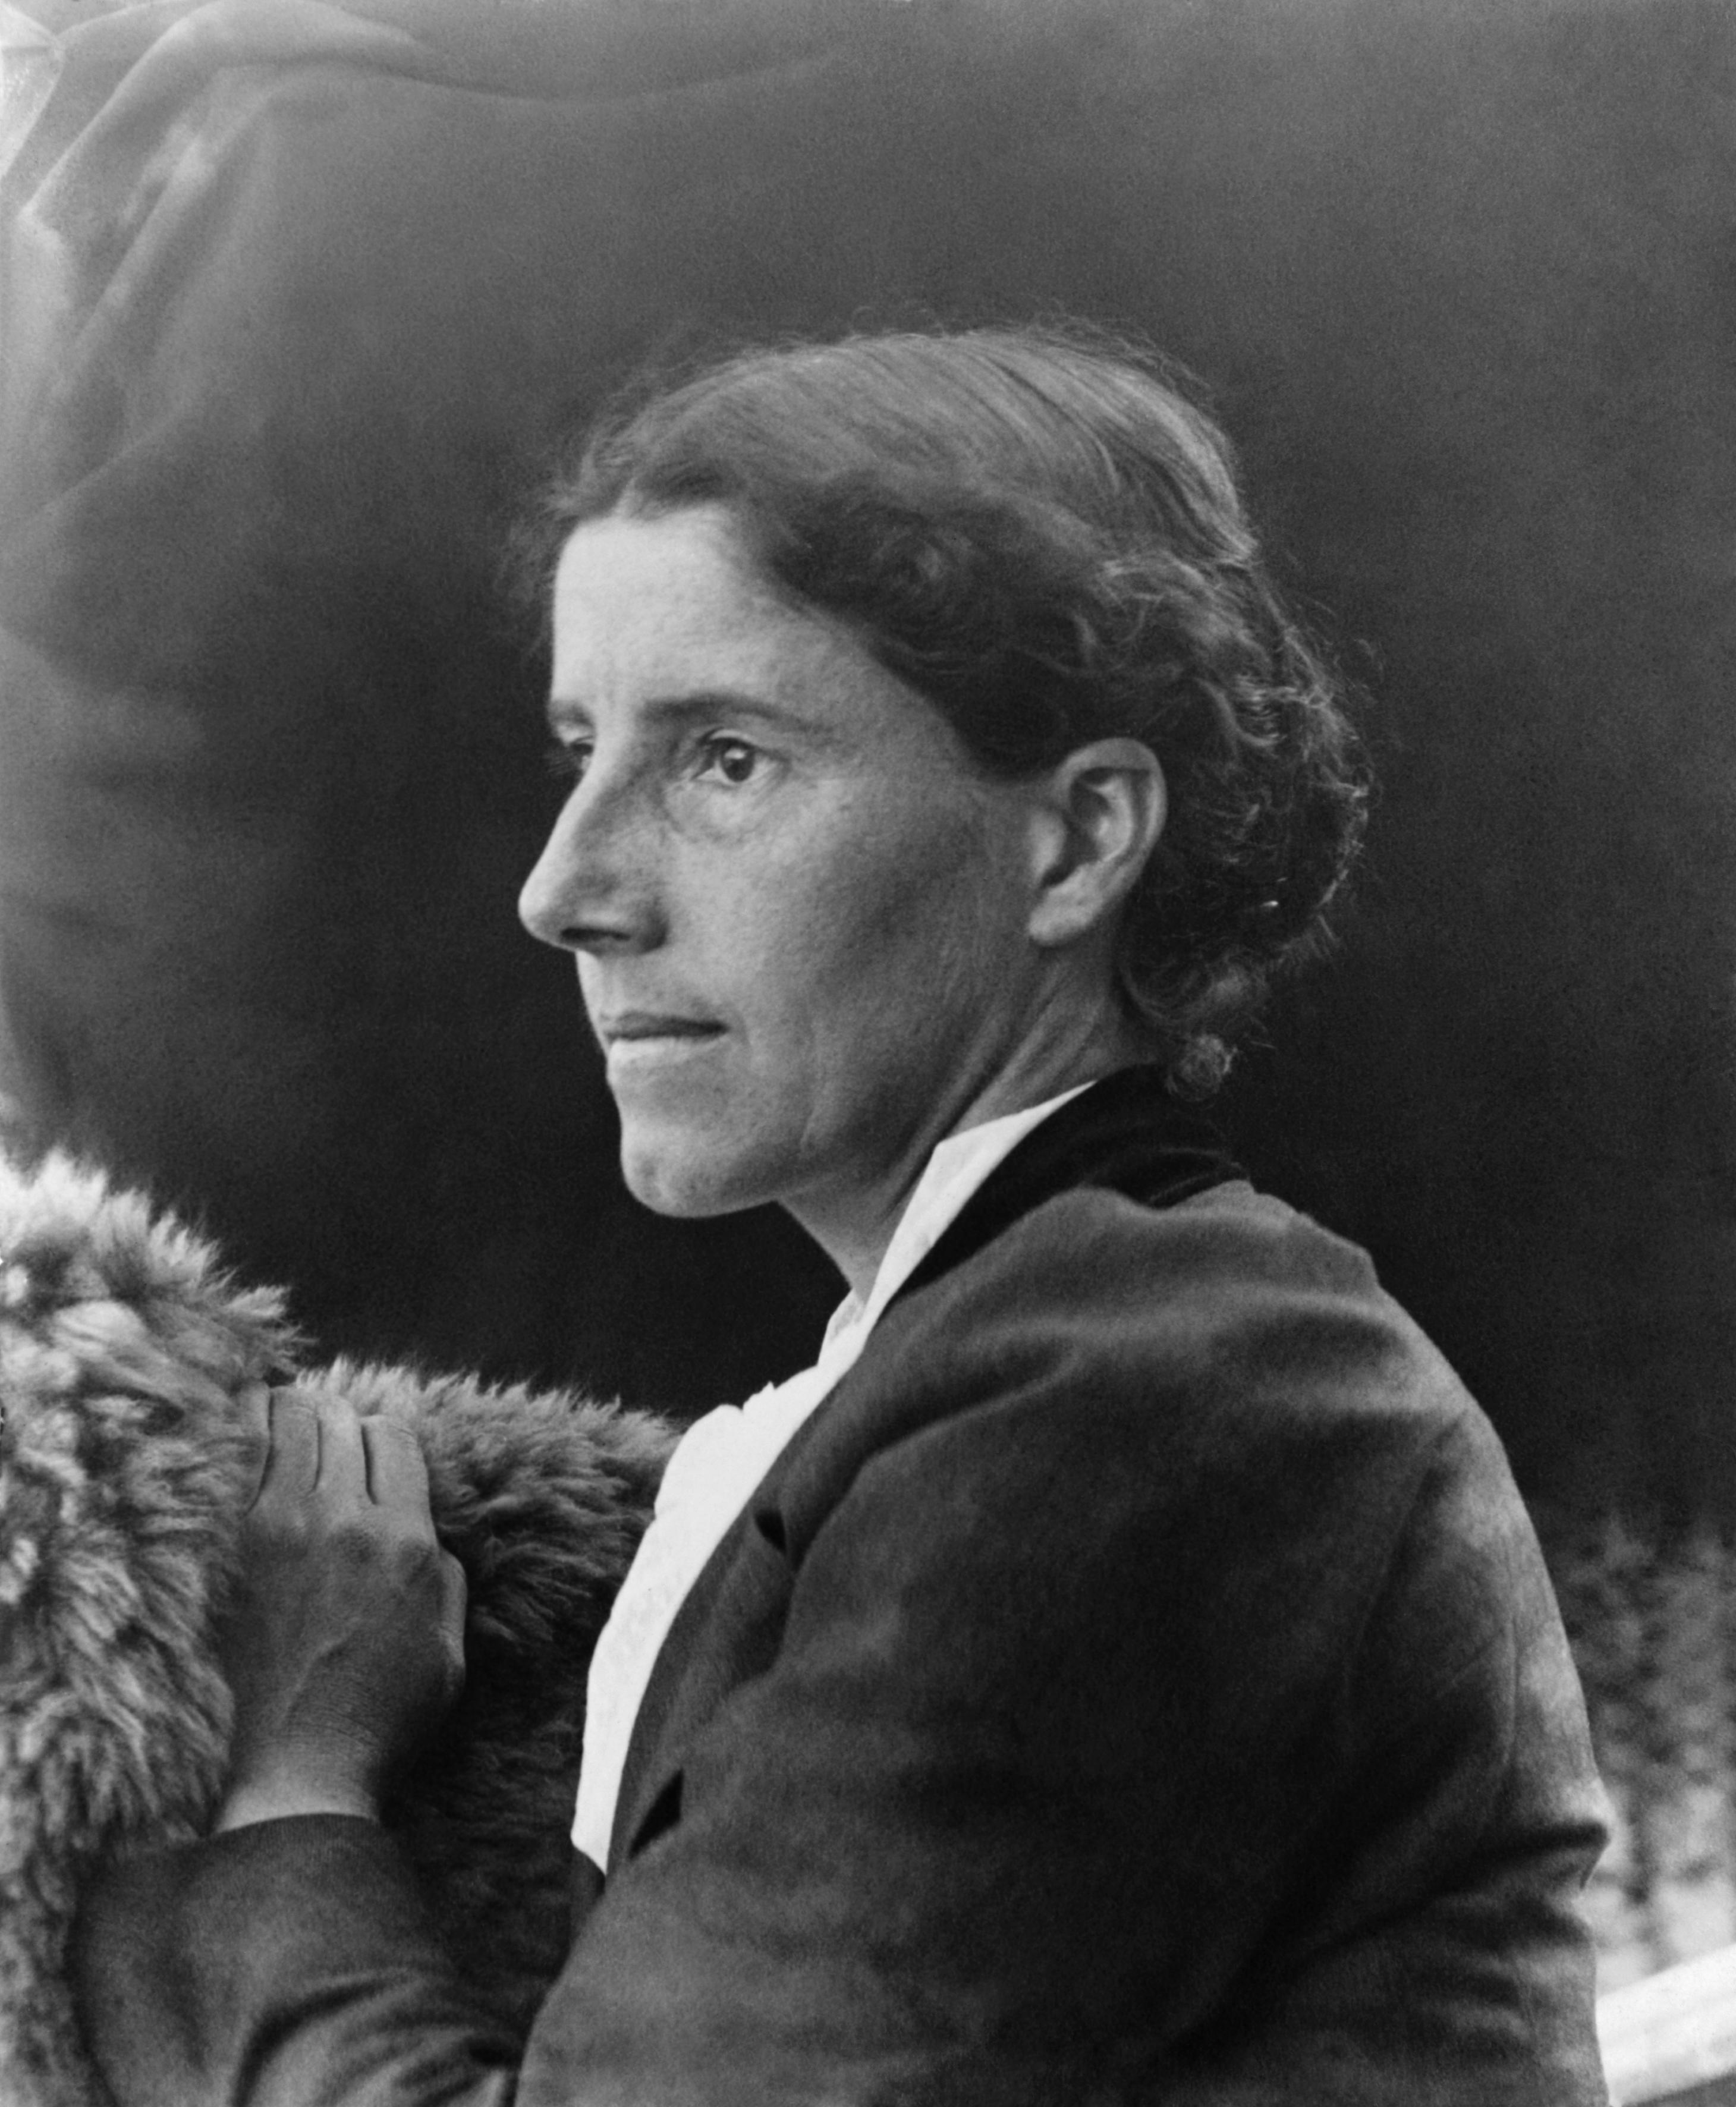 Charlotte Perkins Gilman c. 1900